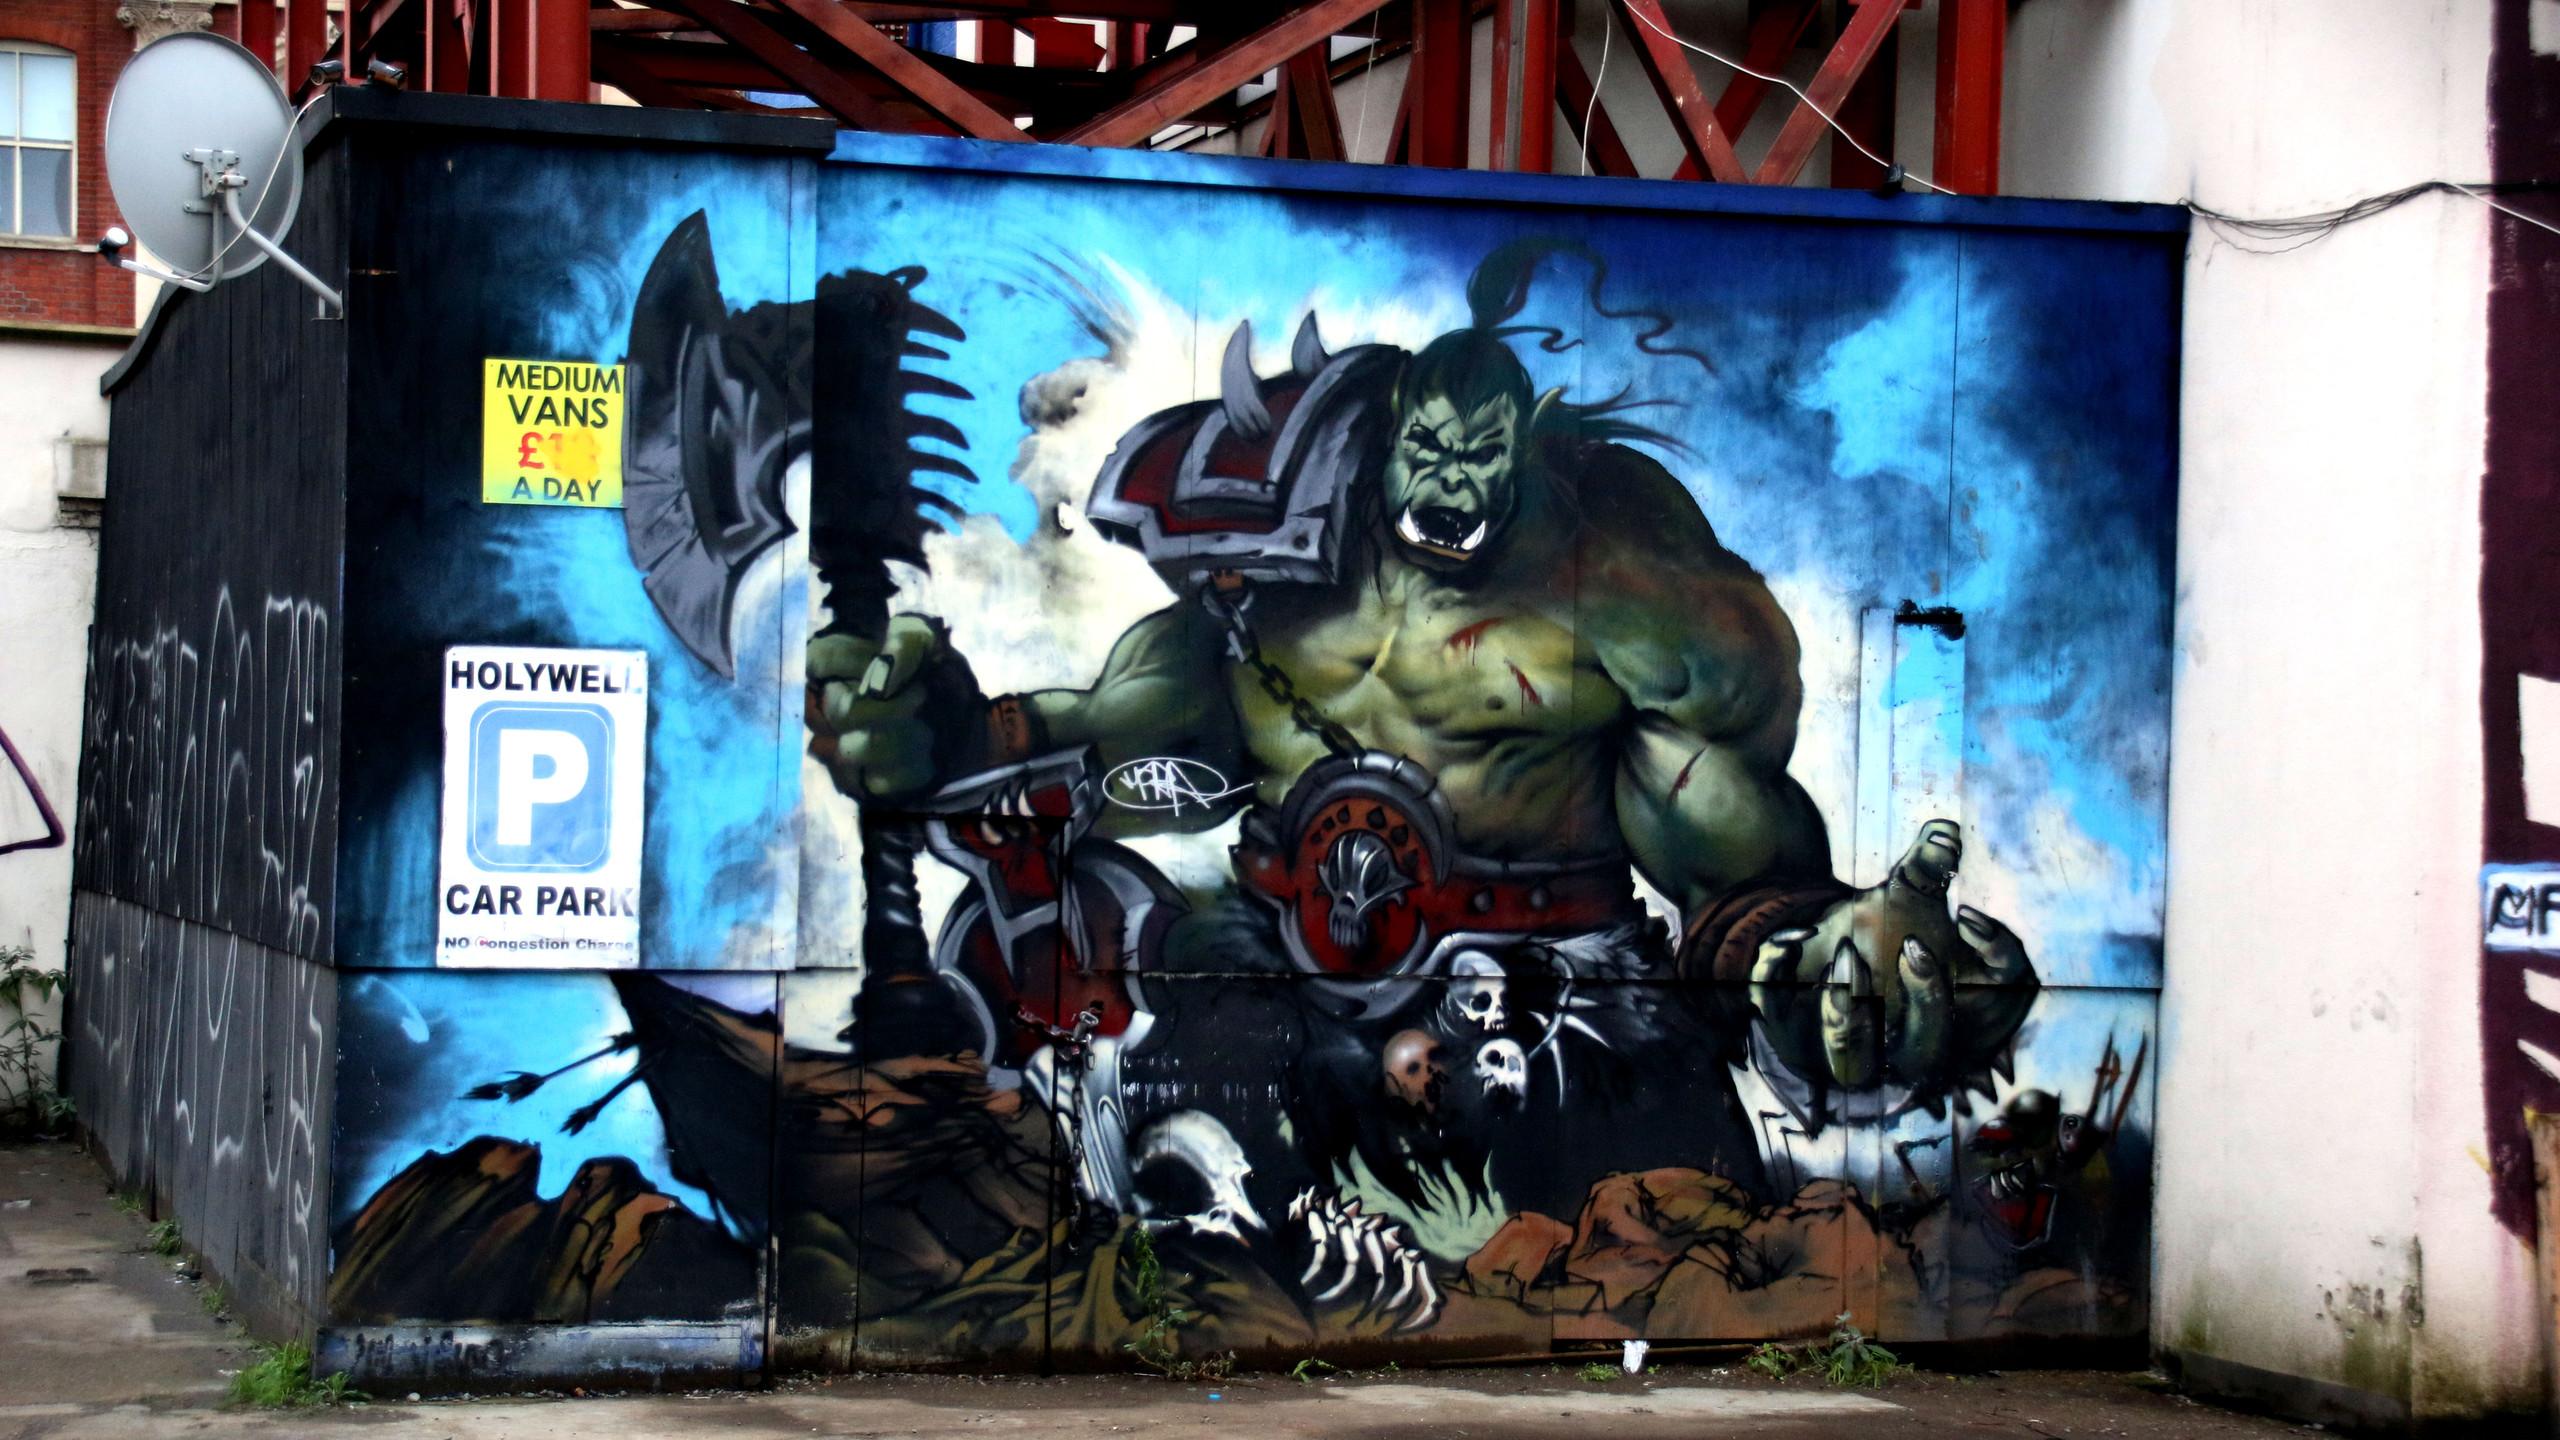 World of Warcraft piece